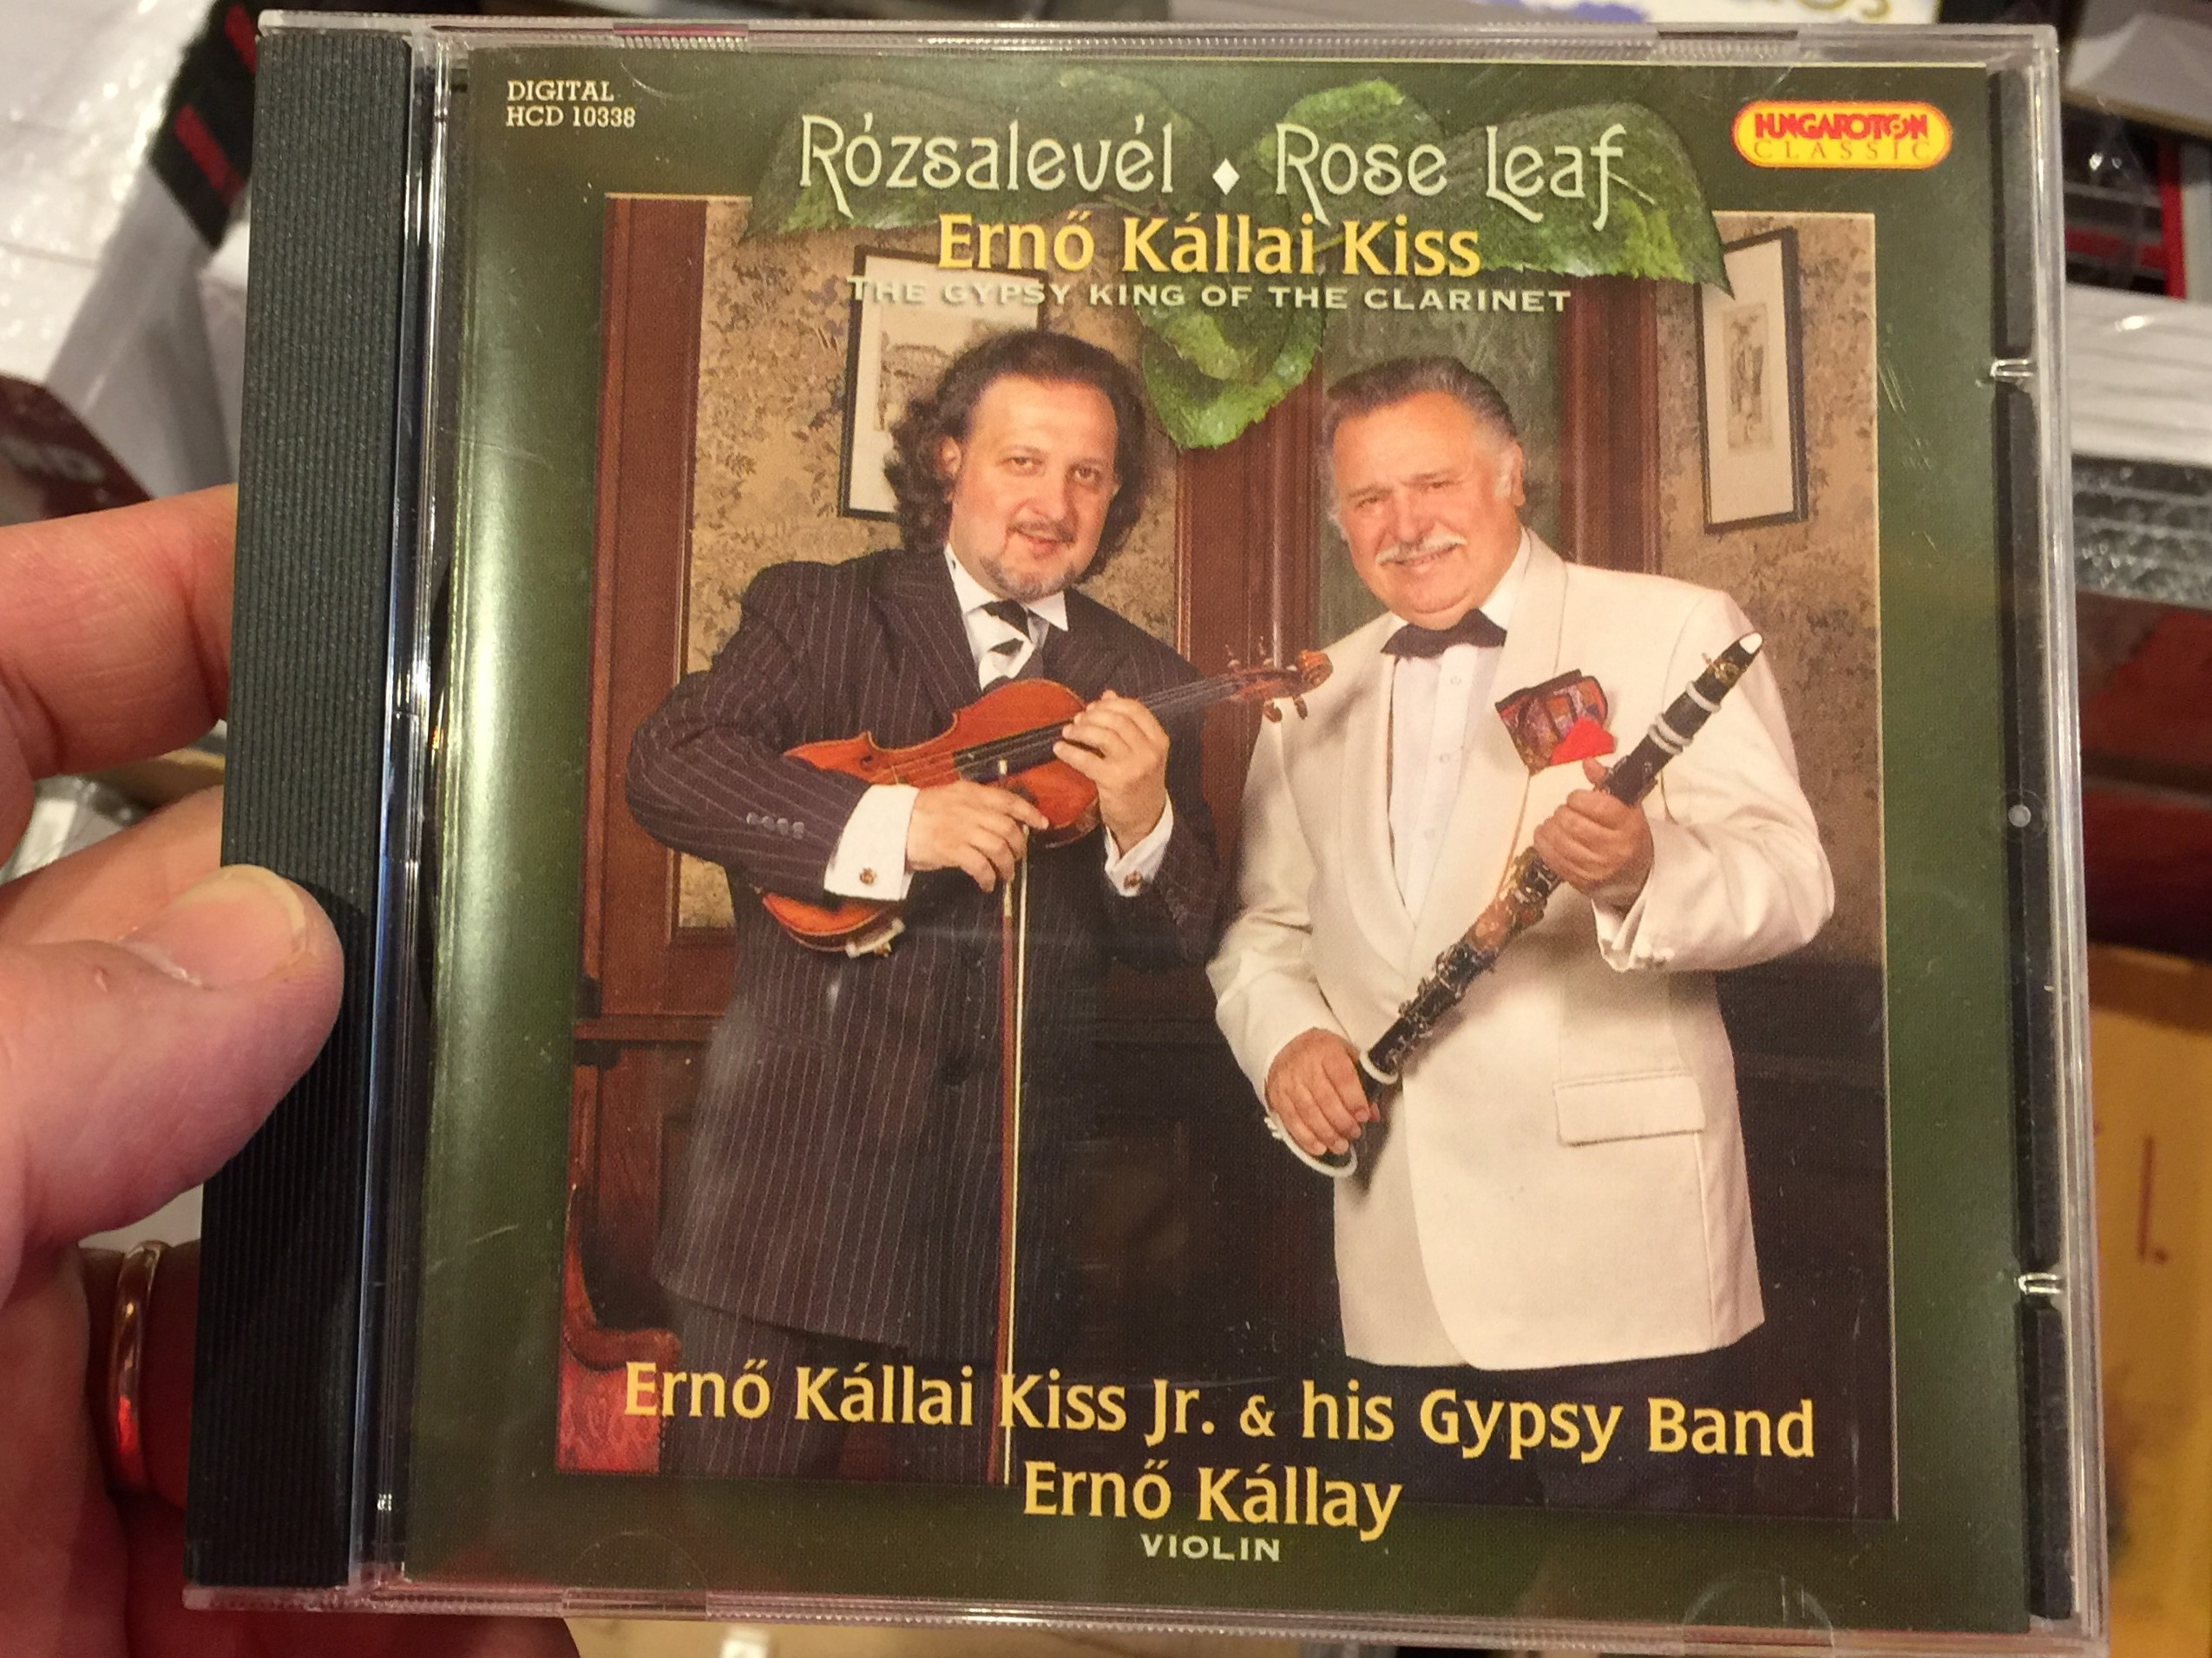 rozsalevel-rose-leaf-erno-kallai-kiss-the-gypsy-king-of-the-clarinet-erno-kallai-kiss-jr.-his-gypsy-band-erno-kallay-violin-hungaroton-classic-audio-cd-2009-strereo-hcd-10338-1-.jpg